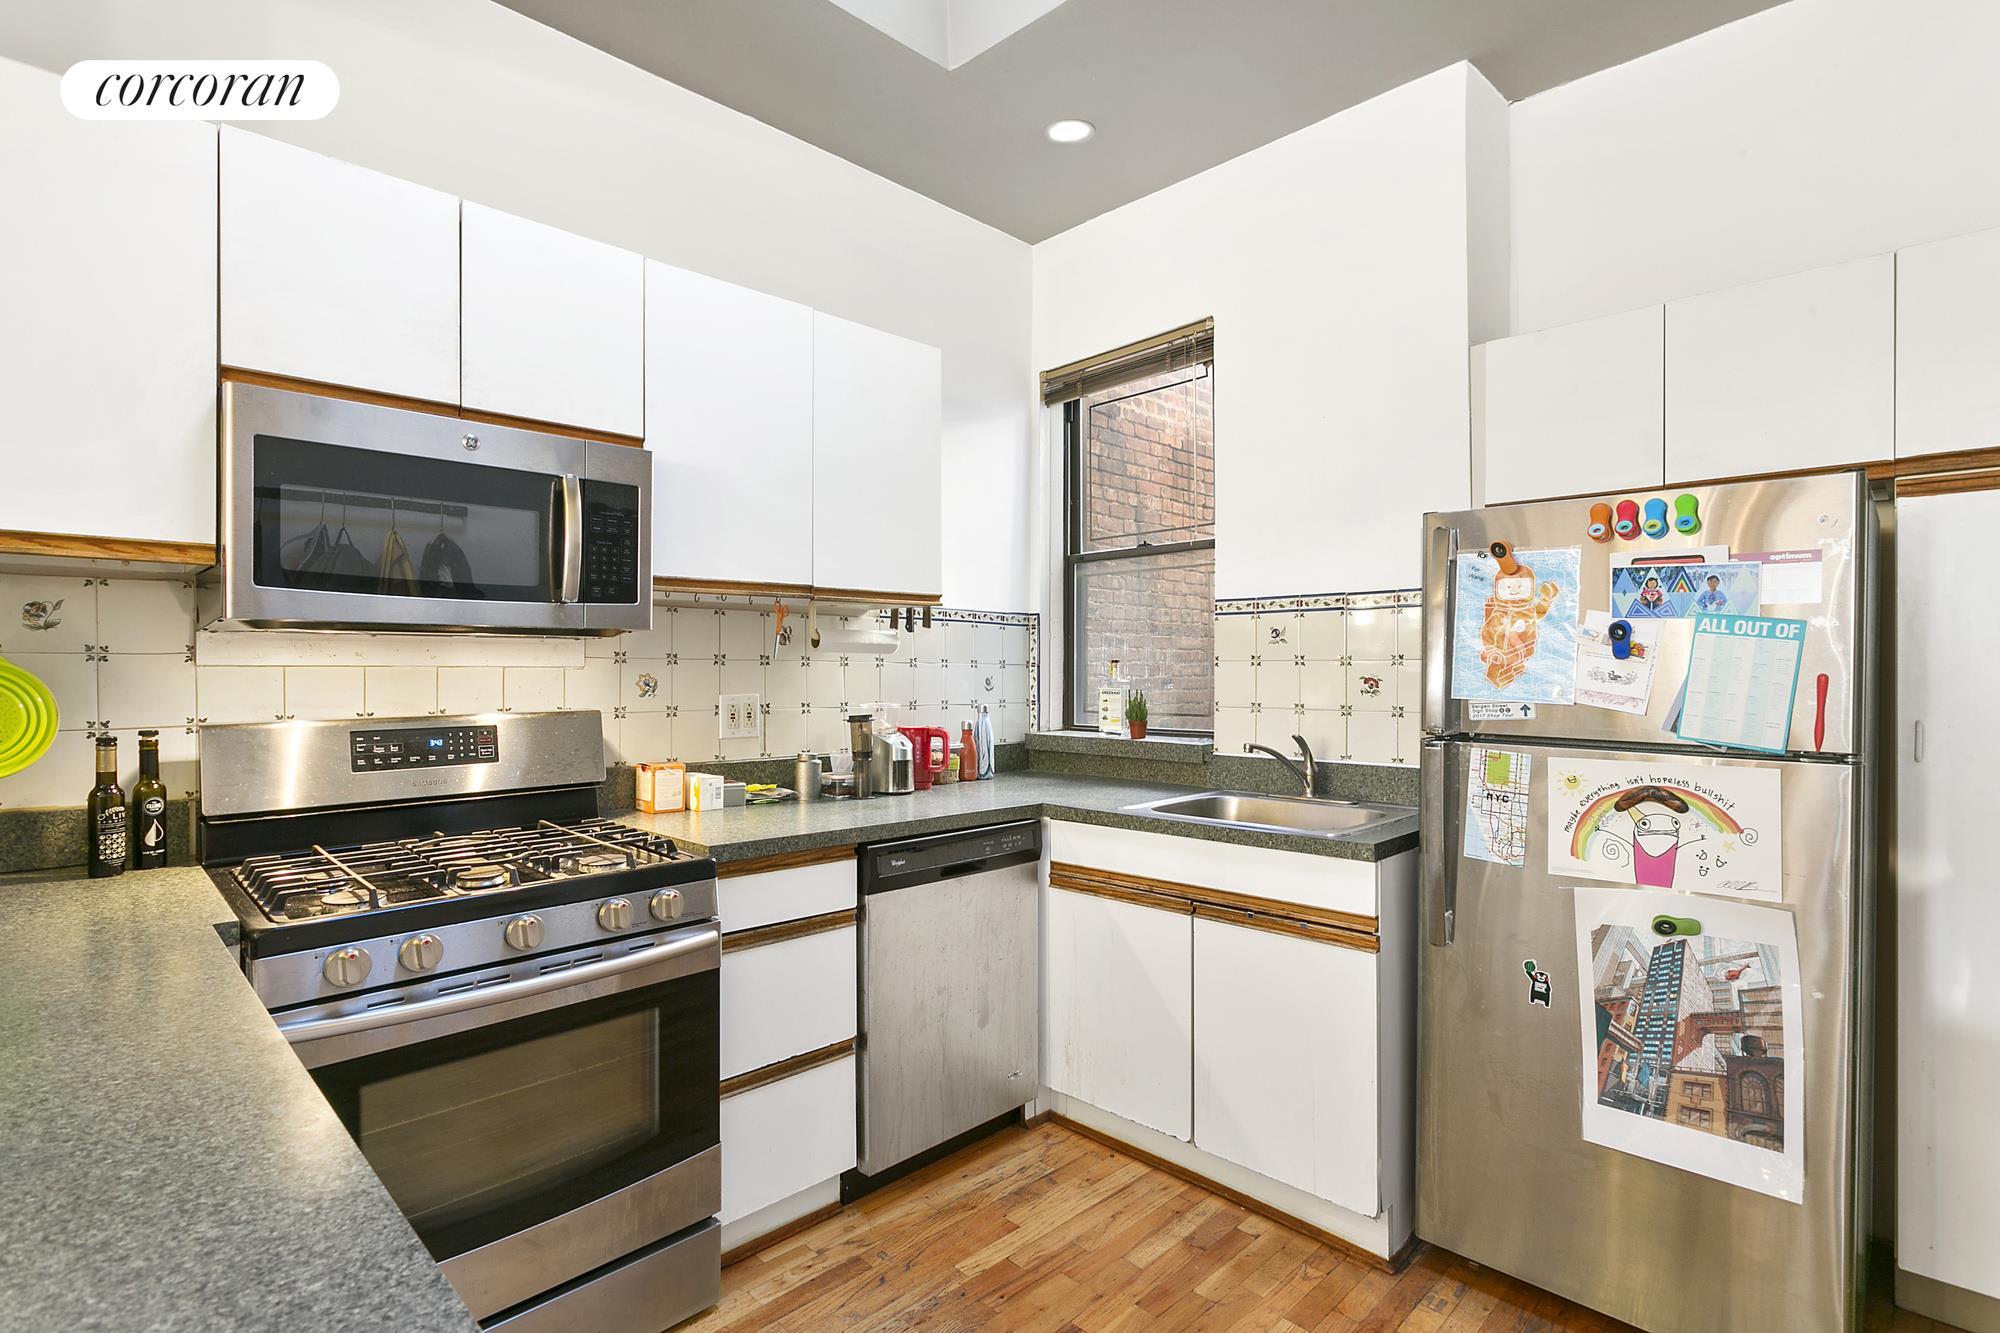 Corcoran, 185 Saint Marks Avenue, Apt. 4L, Prospect Heights Rentals ...